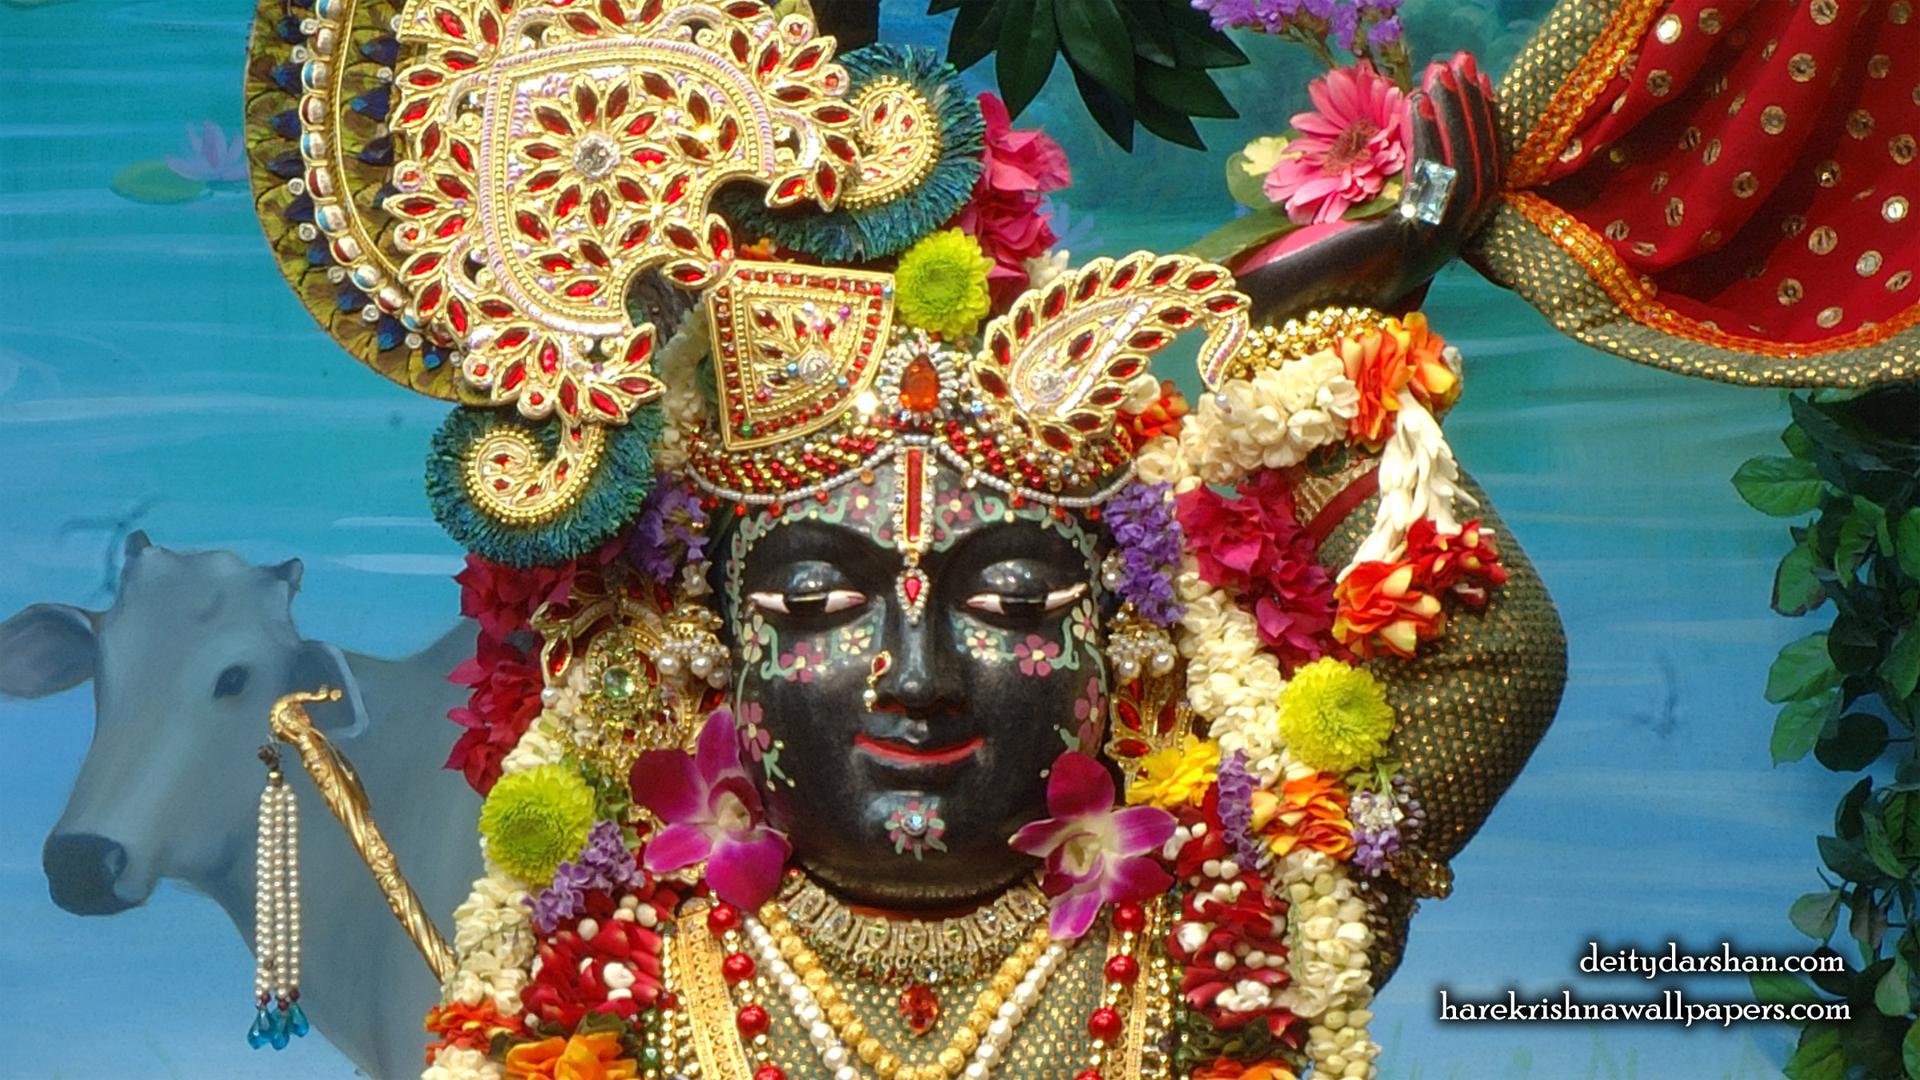 Sri Gopal Close up Wallpaper (024) Size 1920x1080 Download